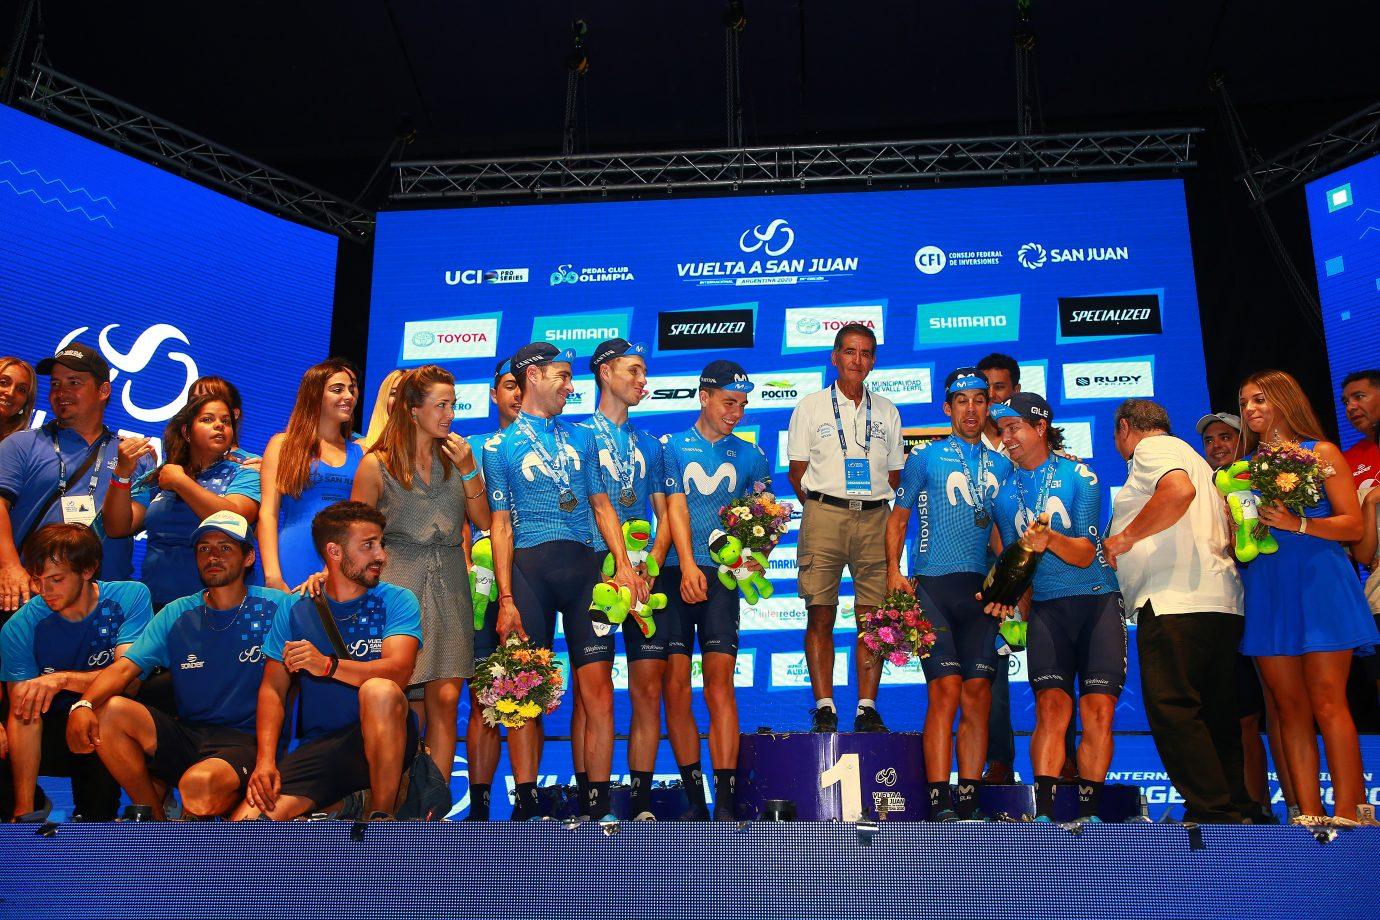 Imagen de la noticia 'Movistar Team on final podium of Vuelta a San Juan'